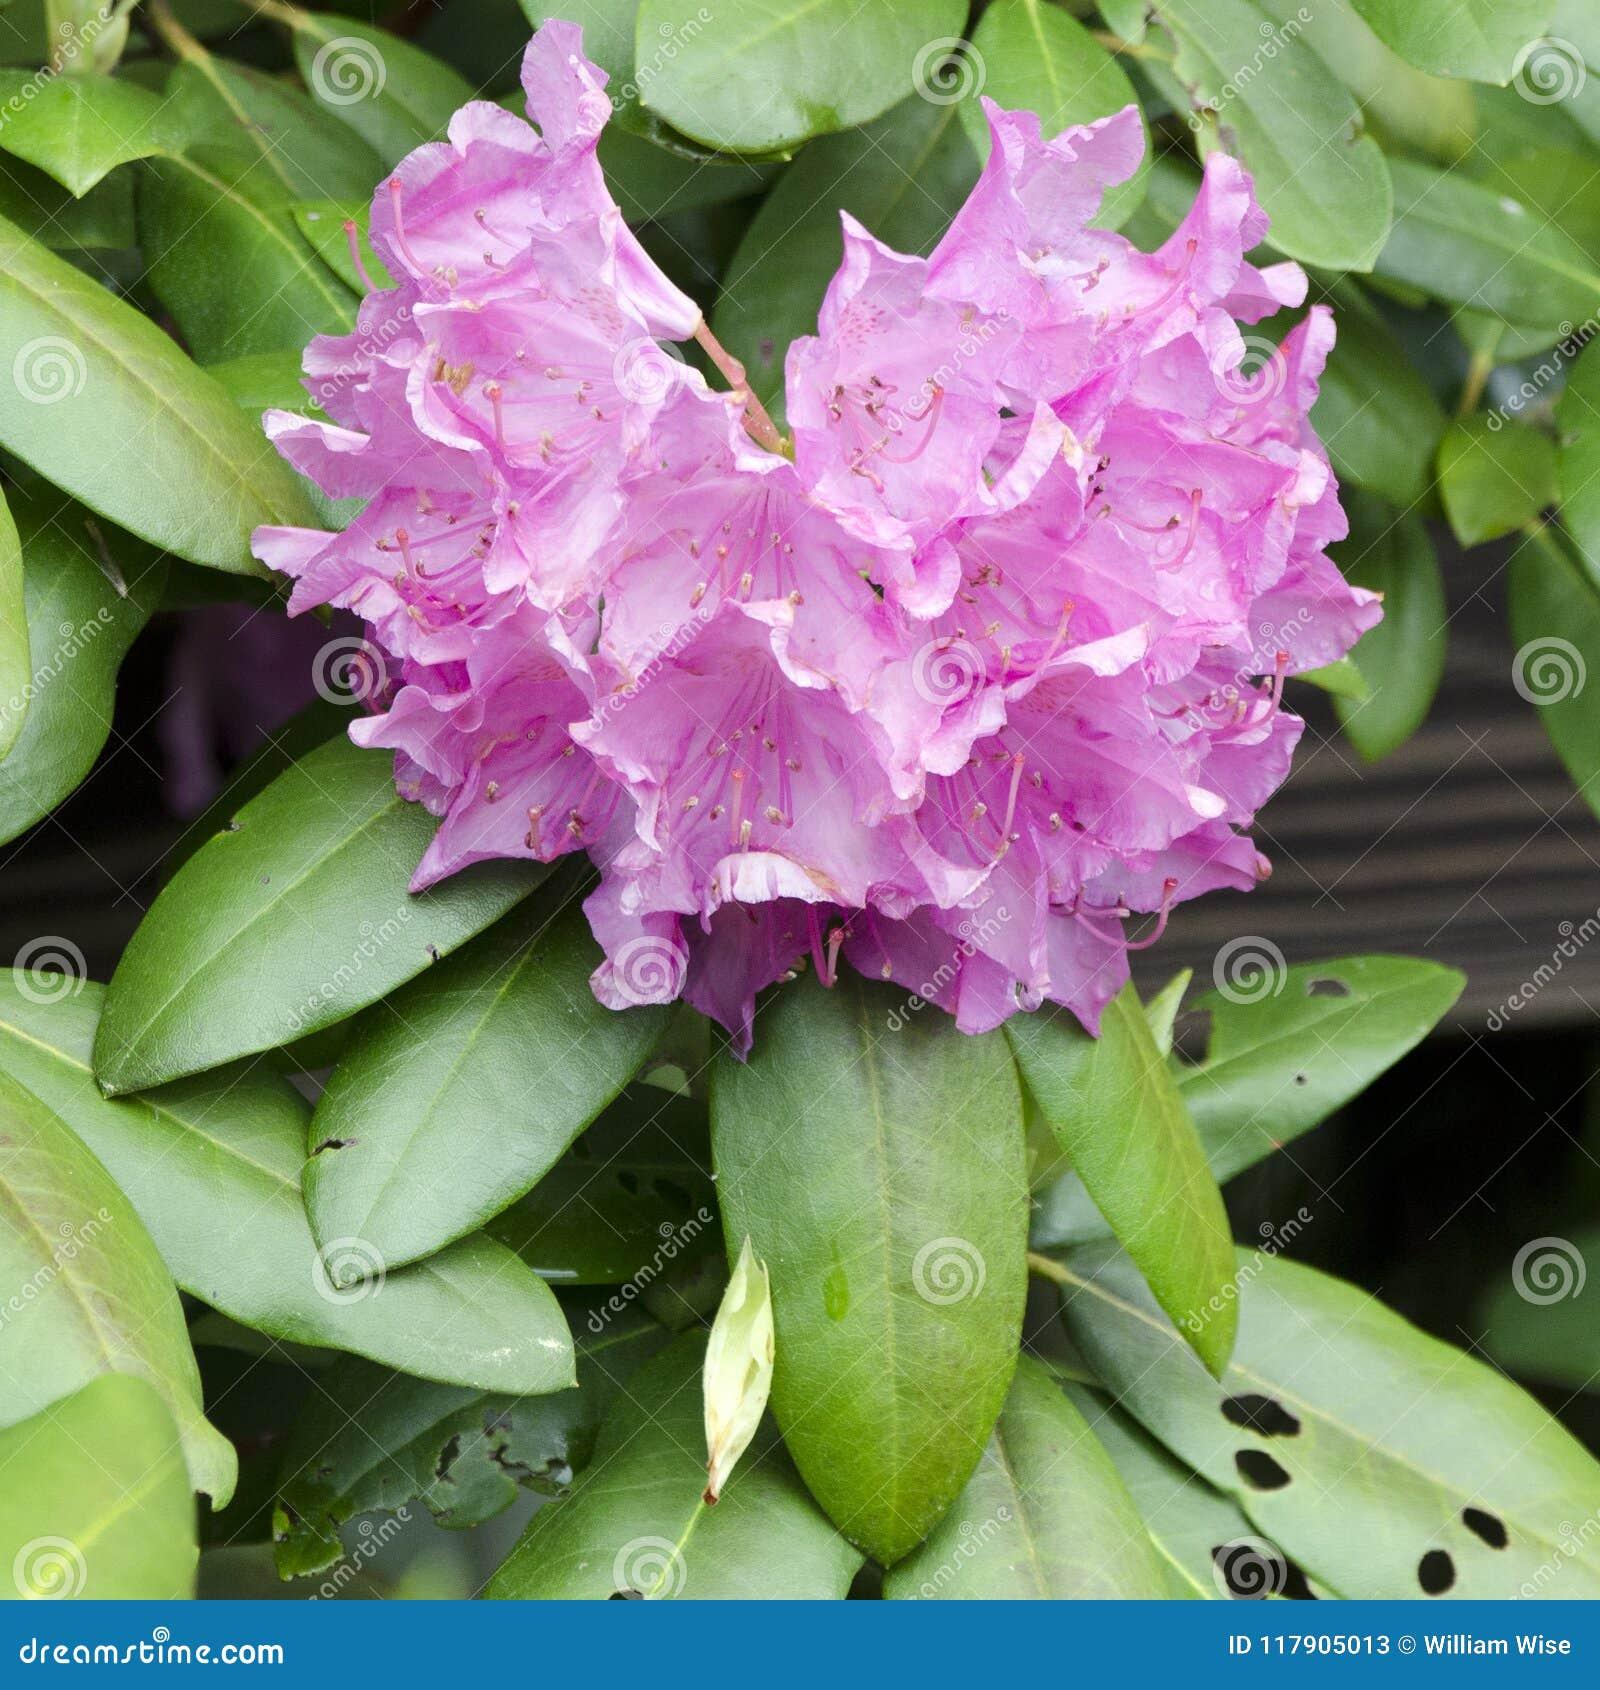 Floracion Purpura De Azalea Rhododendron De La Montana Ridge Mountains Azul Imagen De Archivo Imagen De Ridge Mountains 117905013